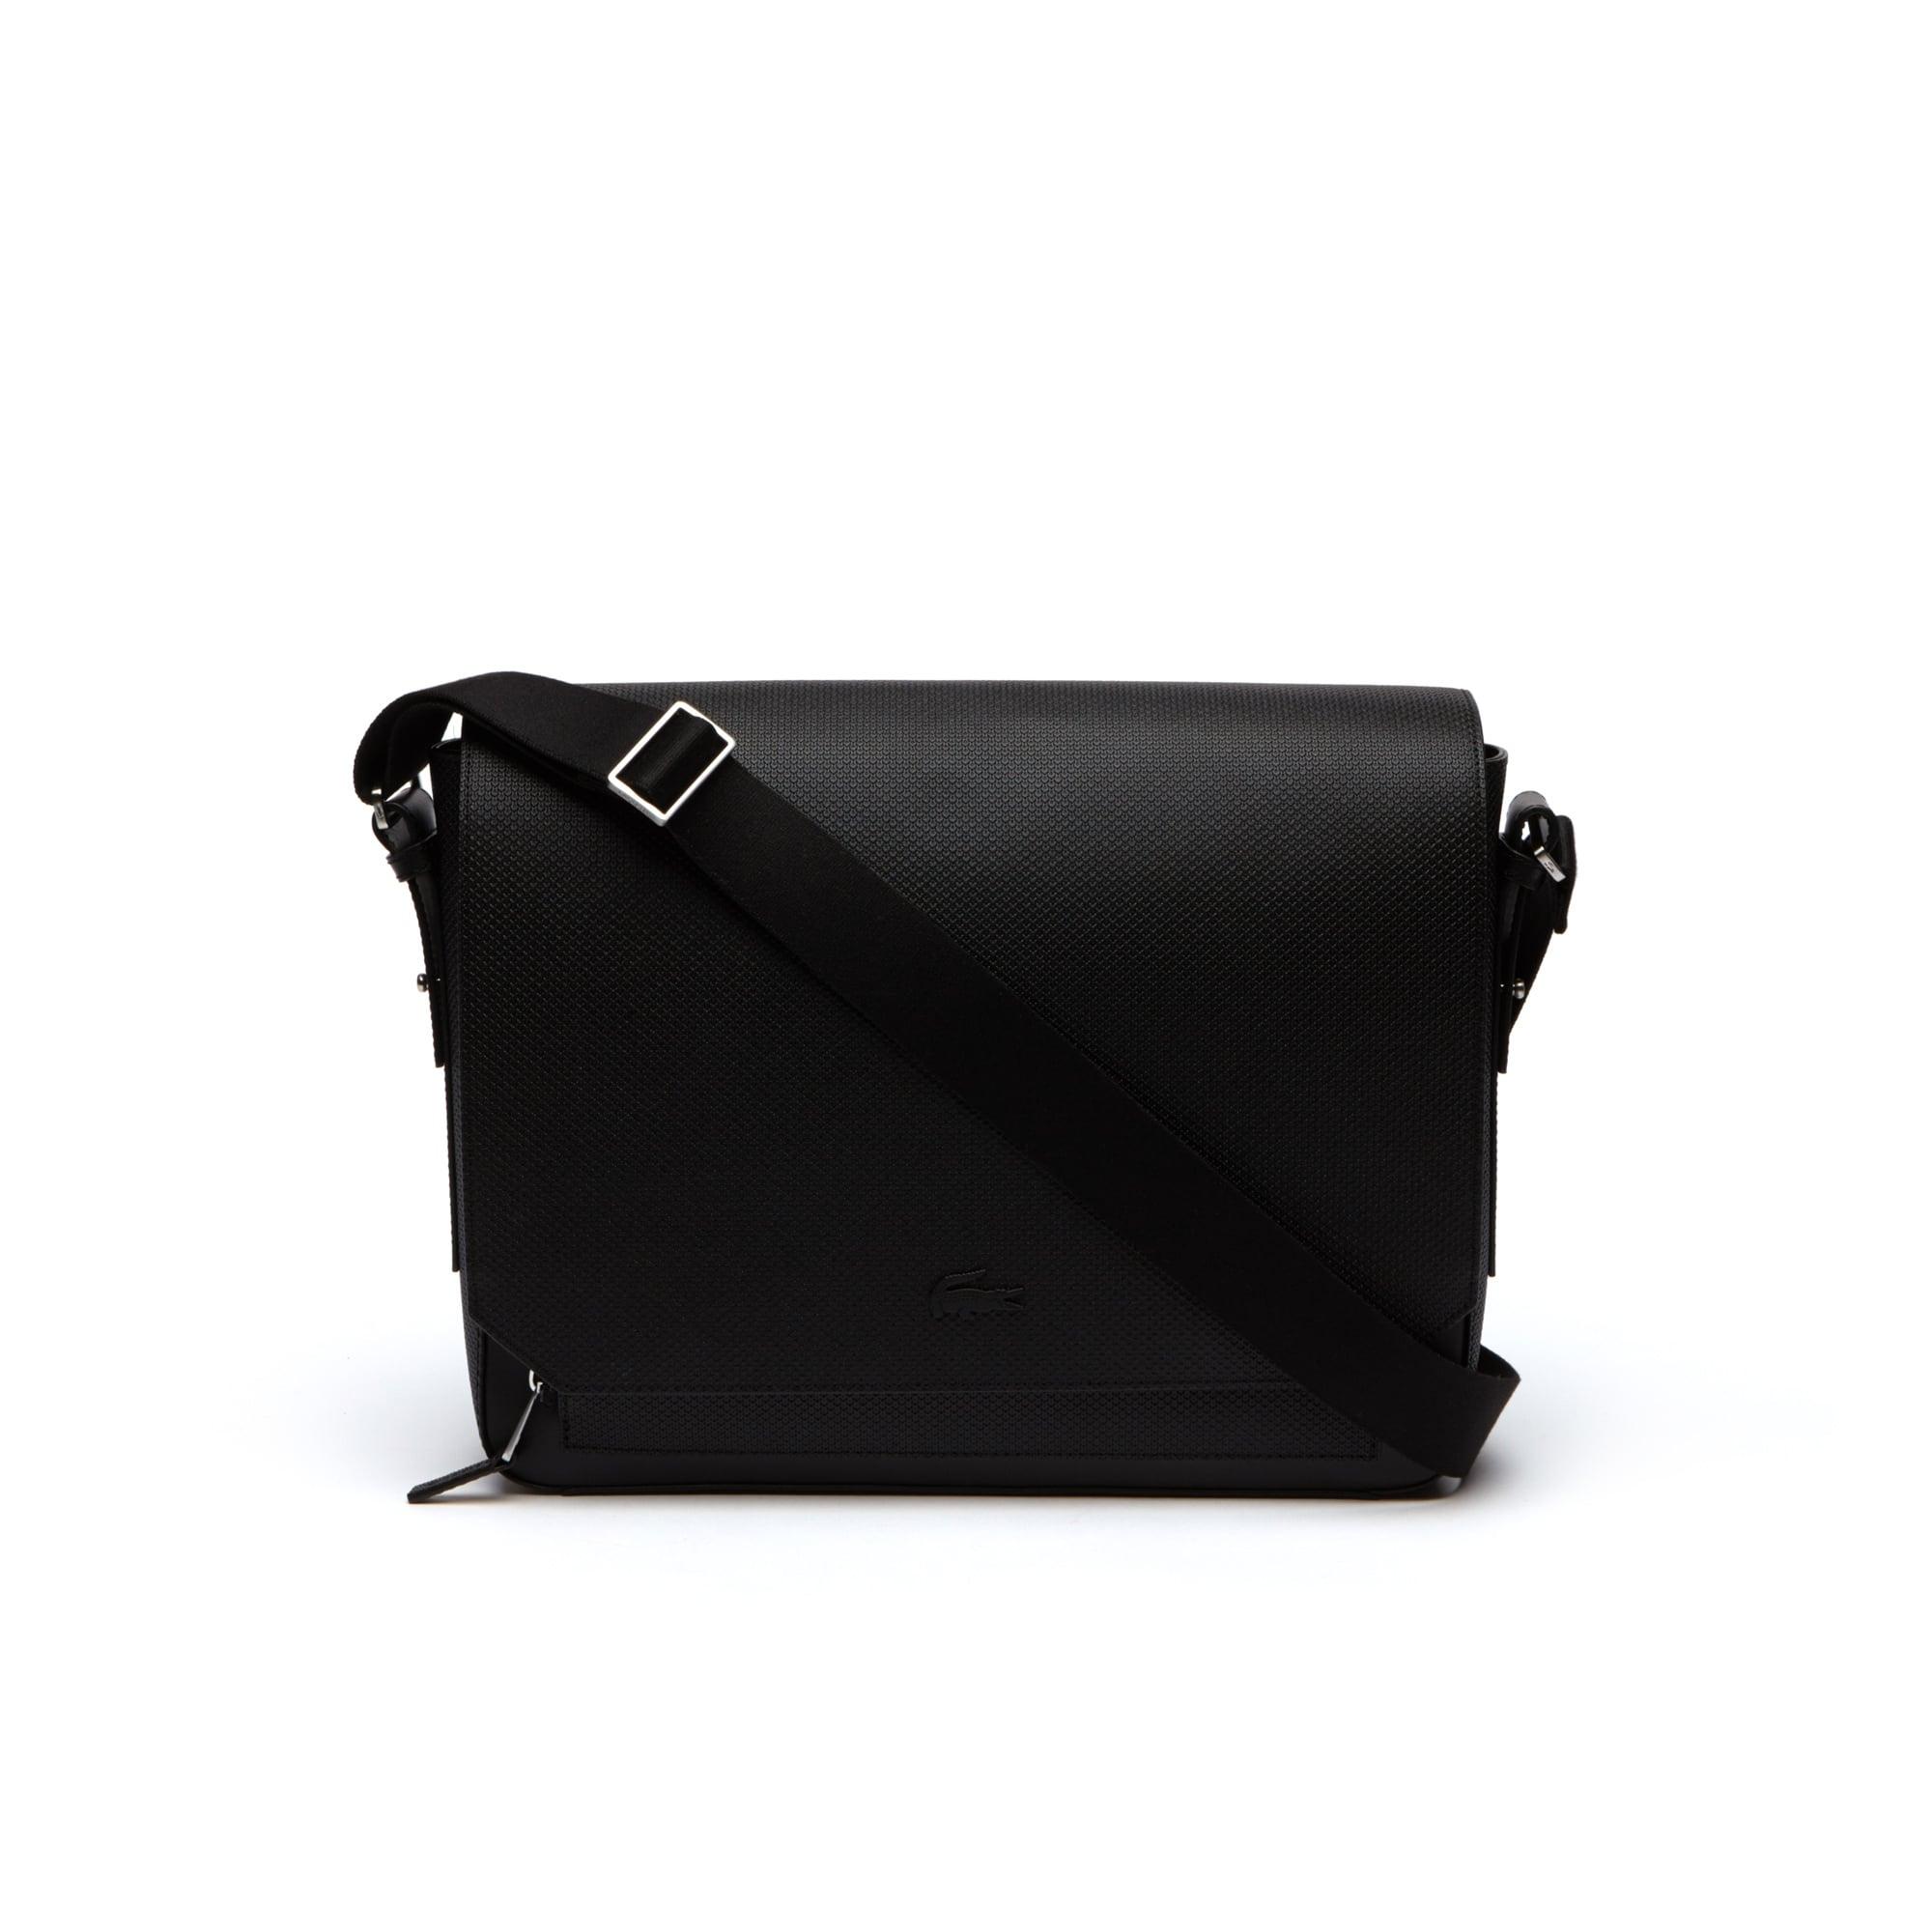 MenLeather Lacoste Bags Goods For Backpacksamp; 8PNOZk0nwX